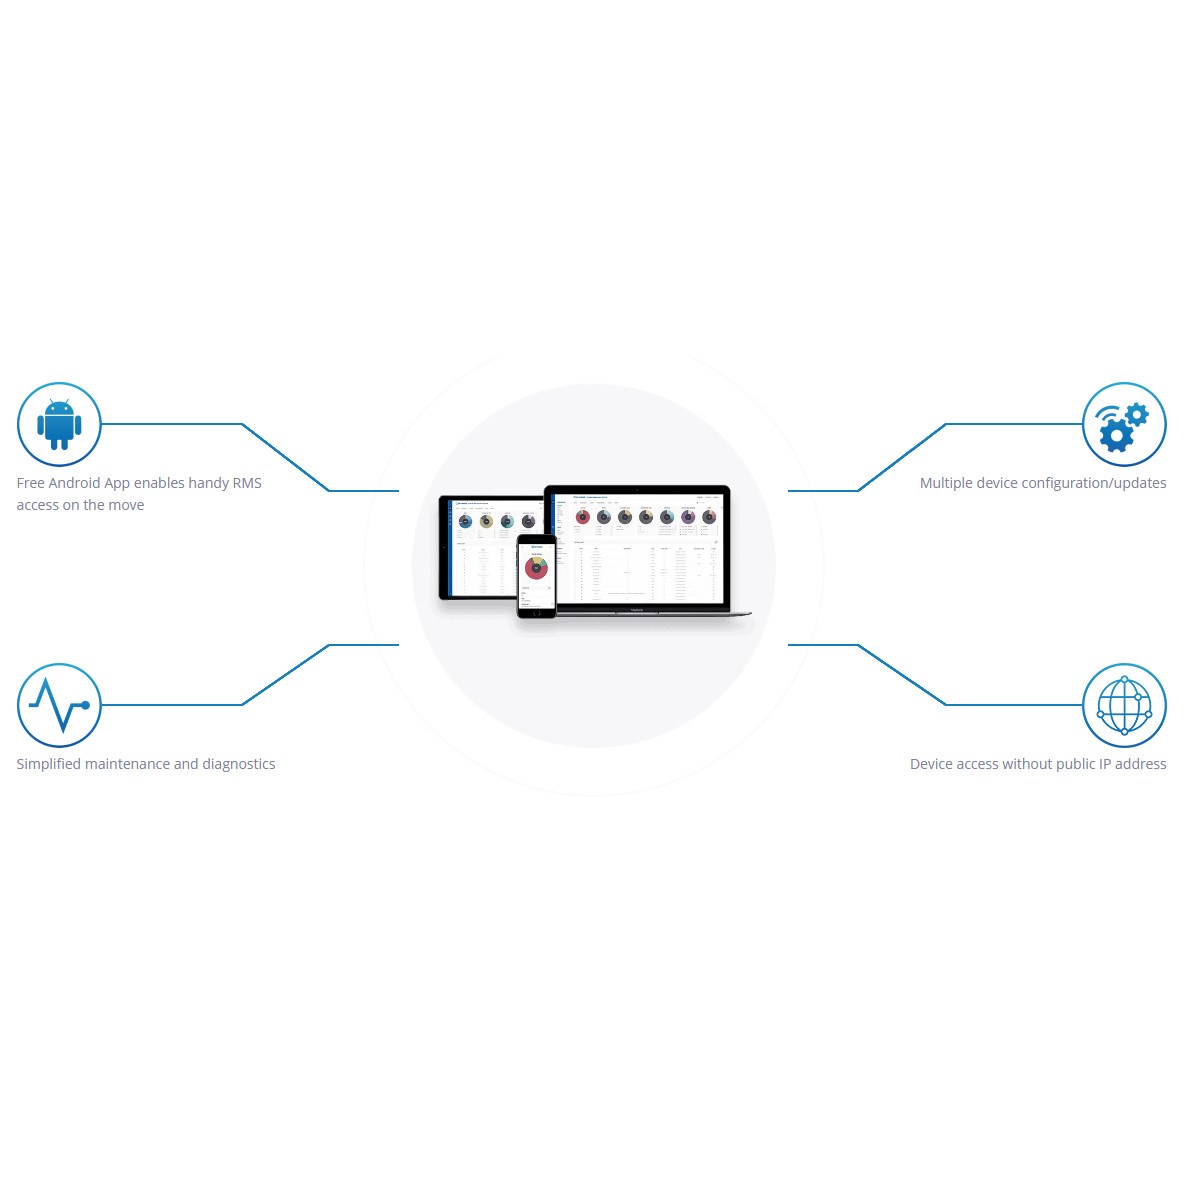 Remote Management System (RMS) enables remote management